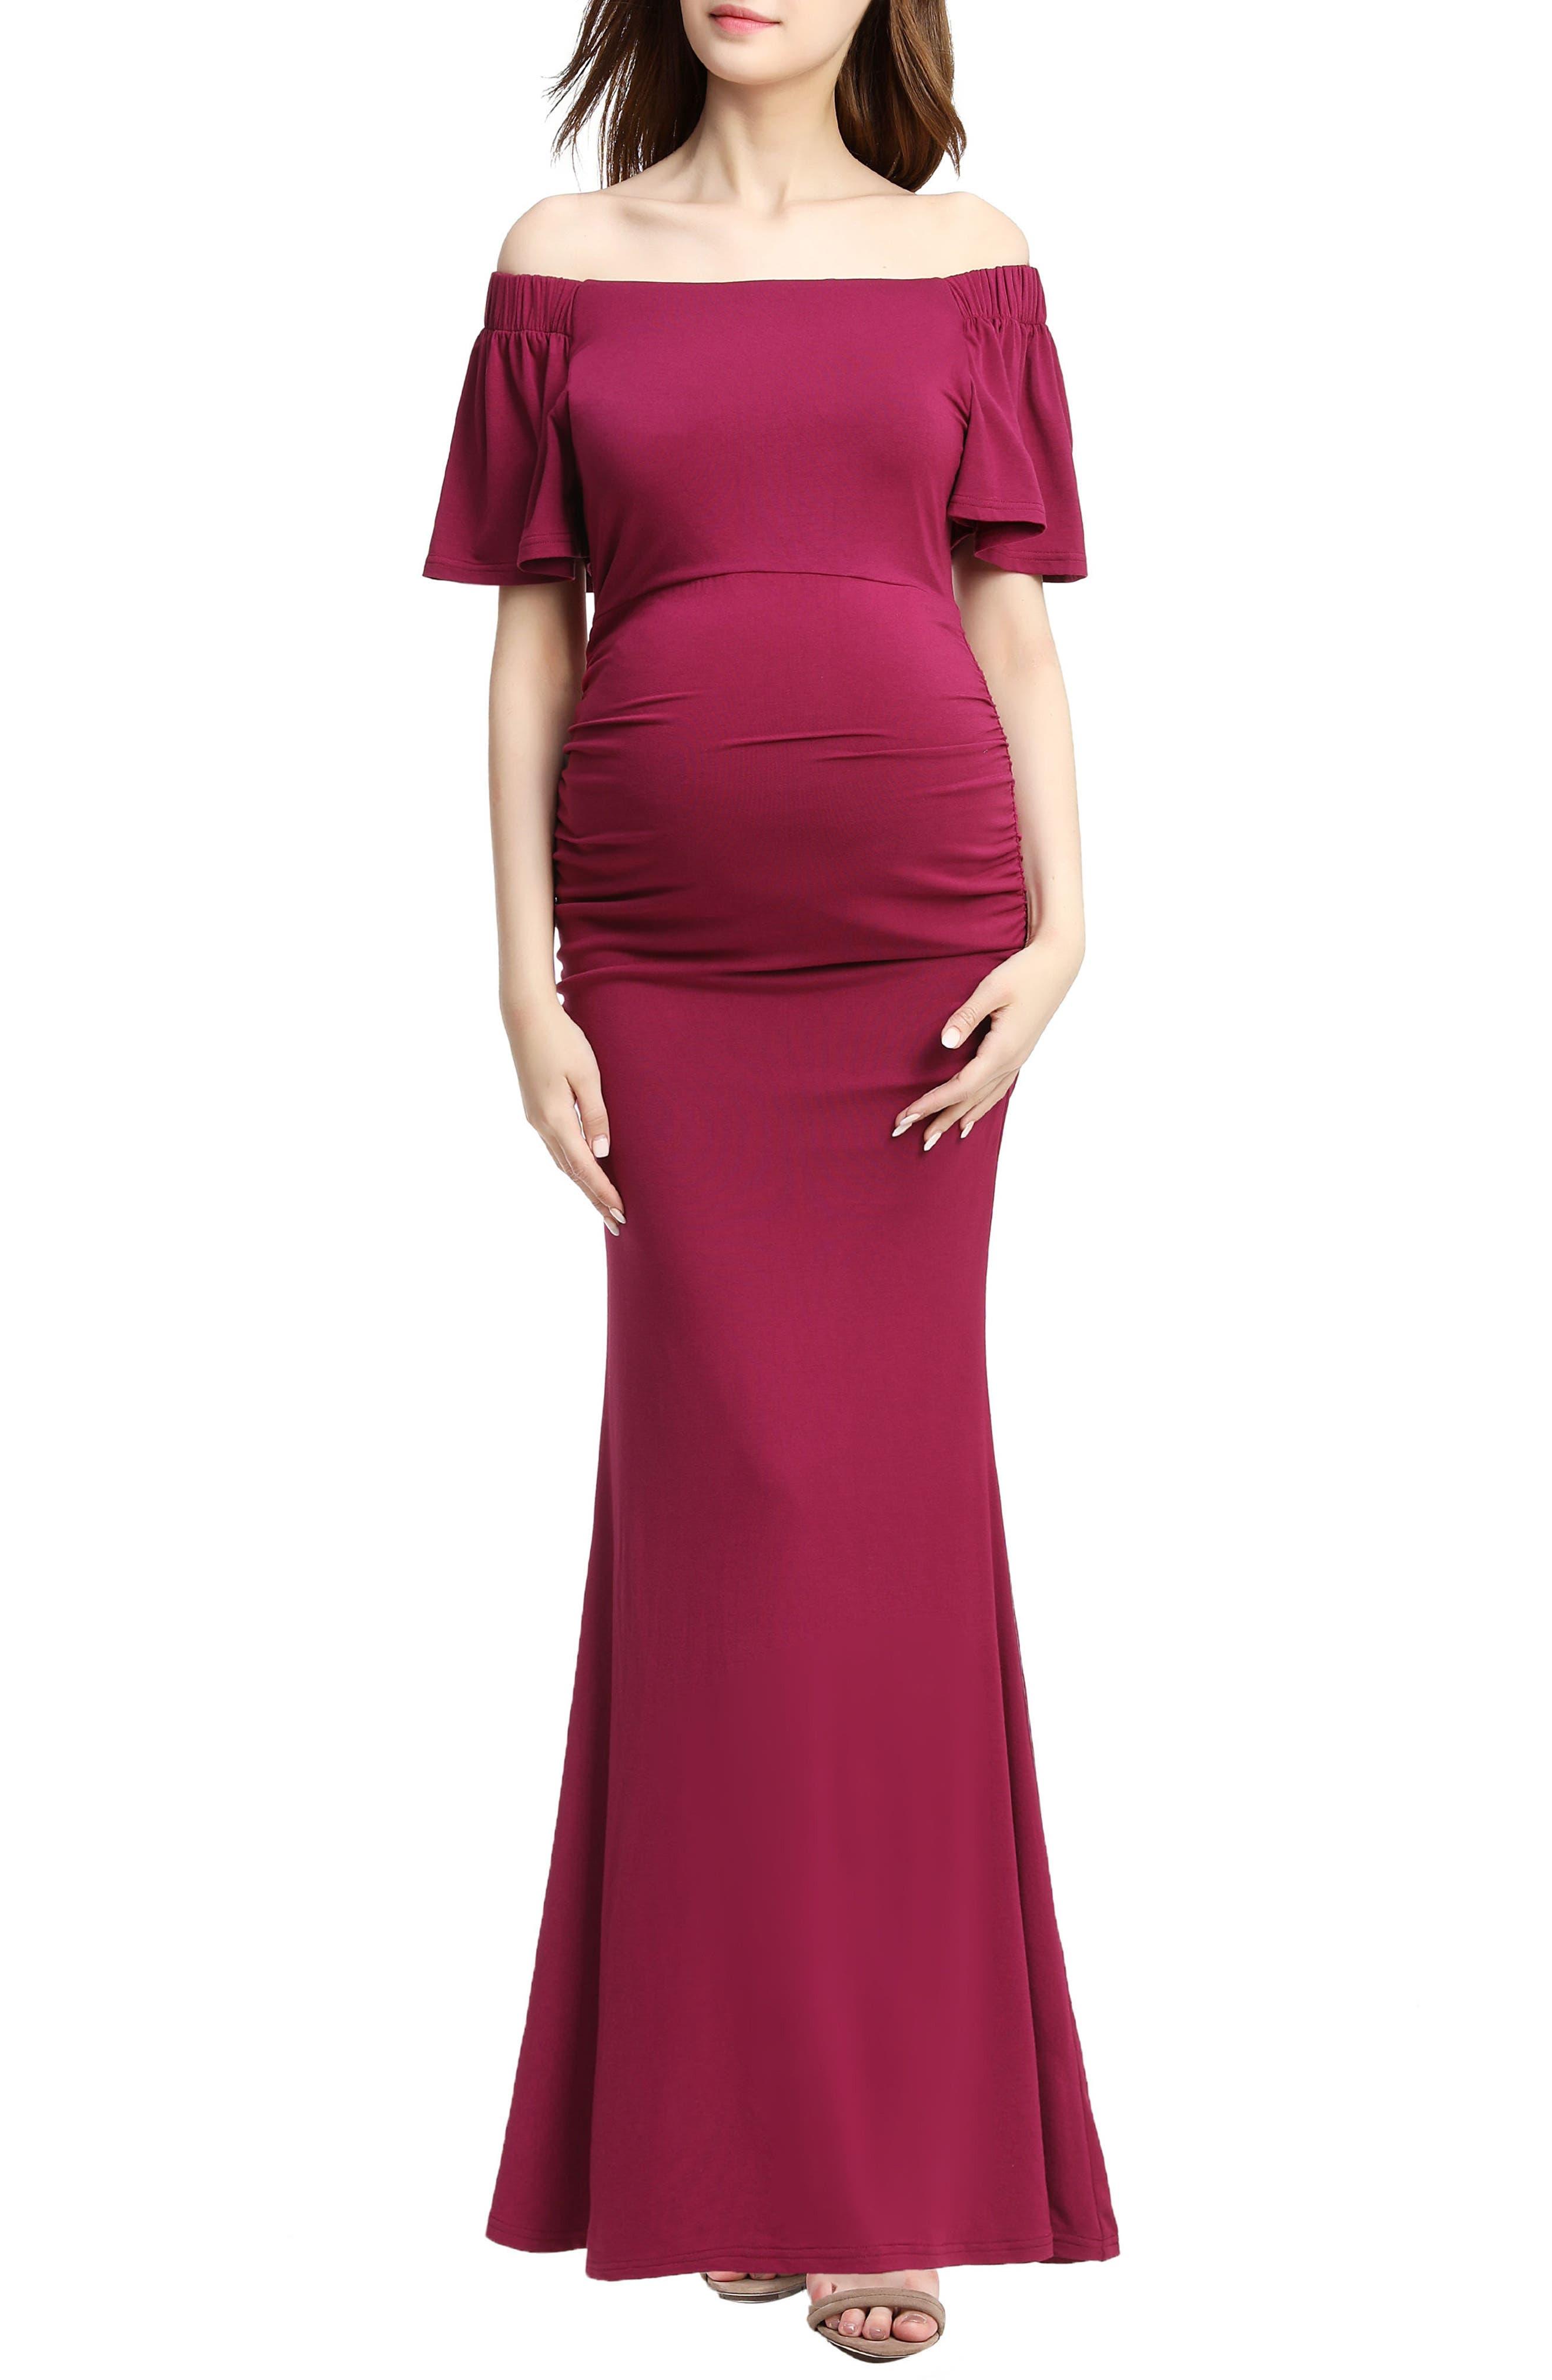 Abigail Off the Shoulder Maternity Dress,                             Main thumbnail 1, color,                             Berry